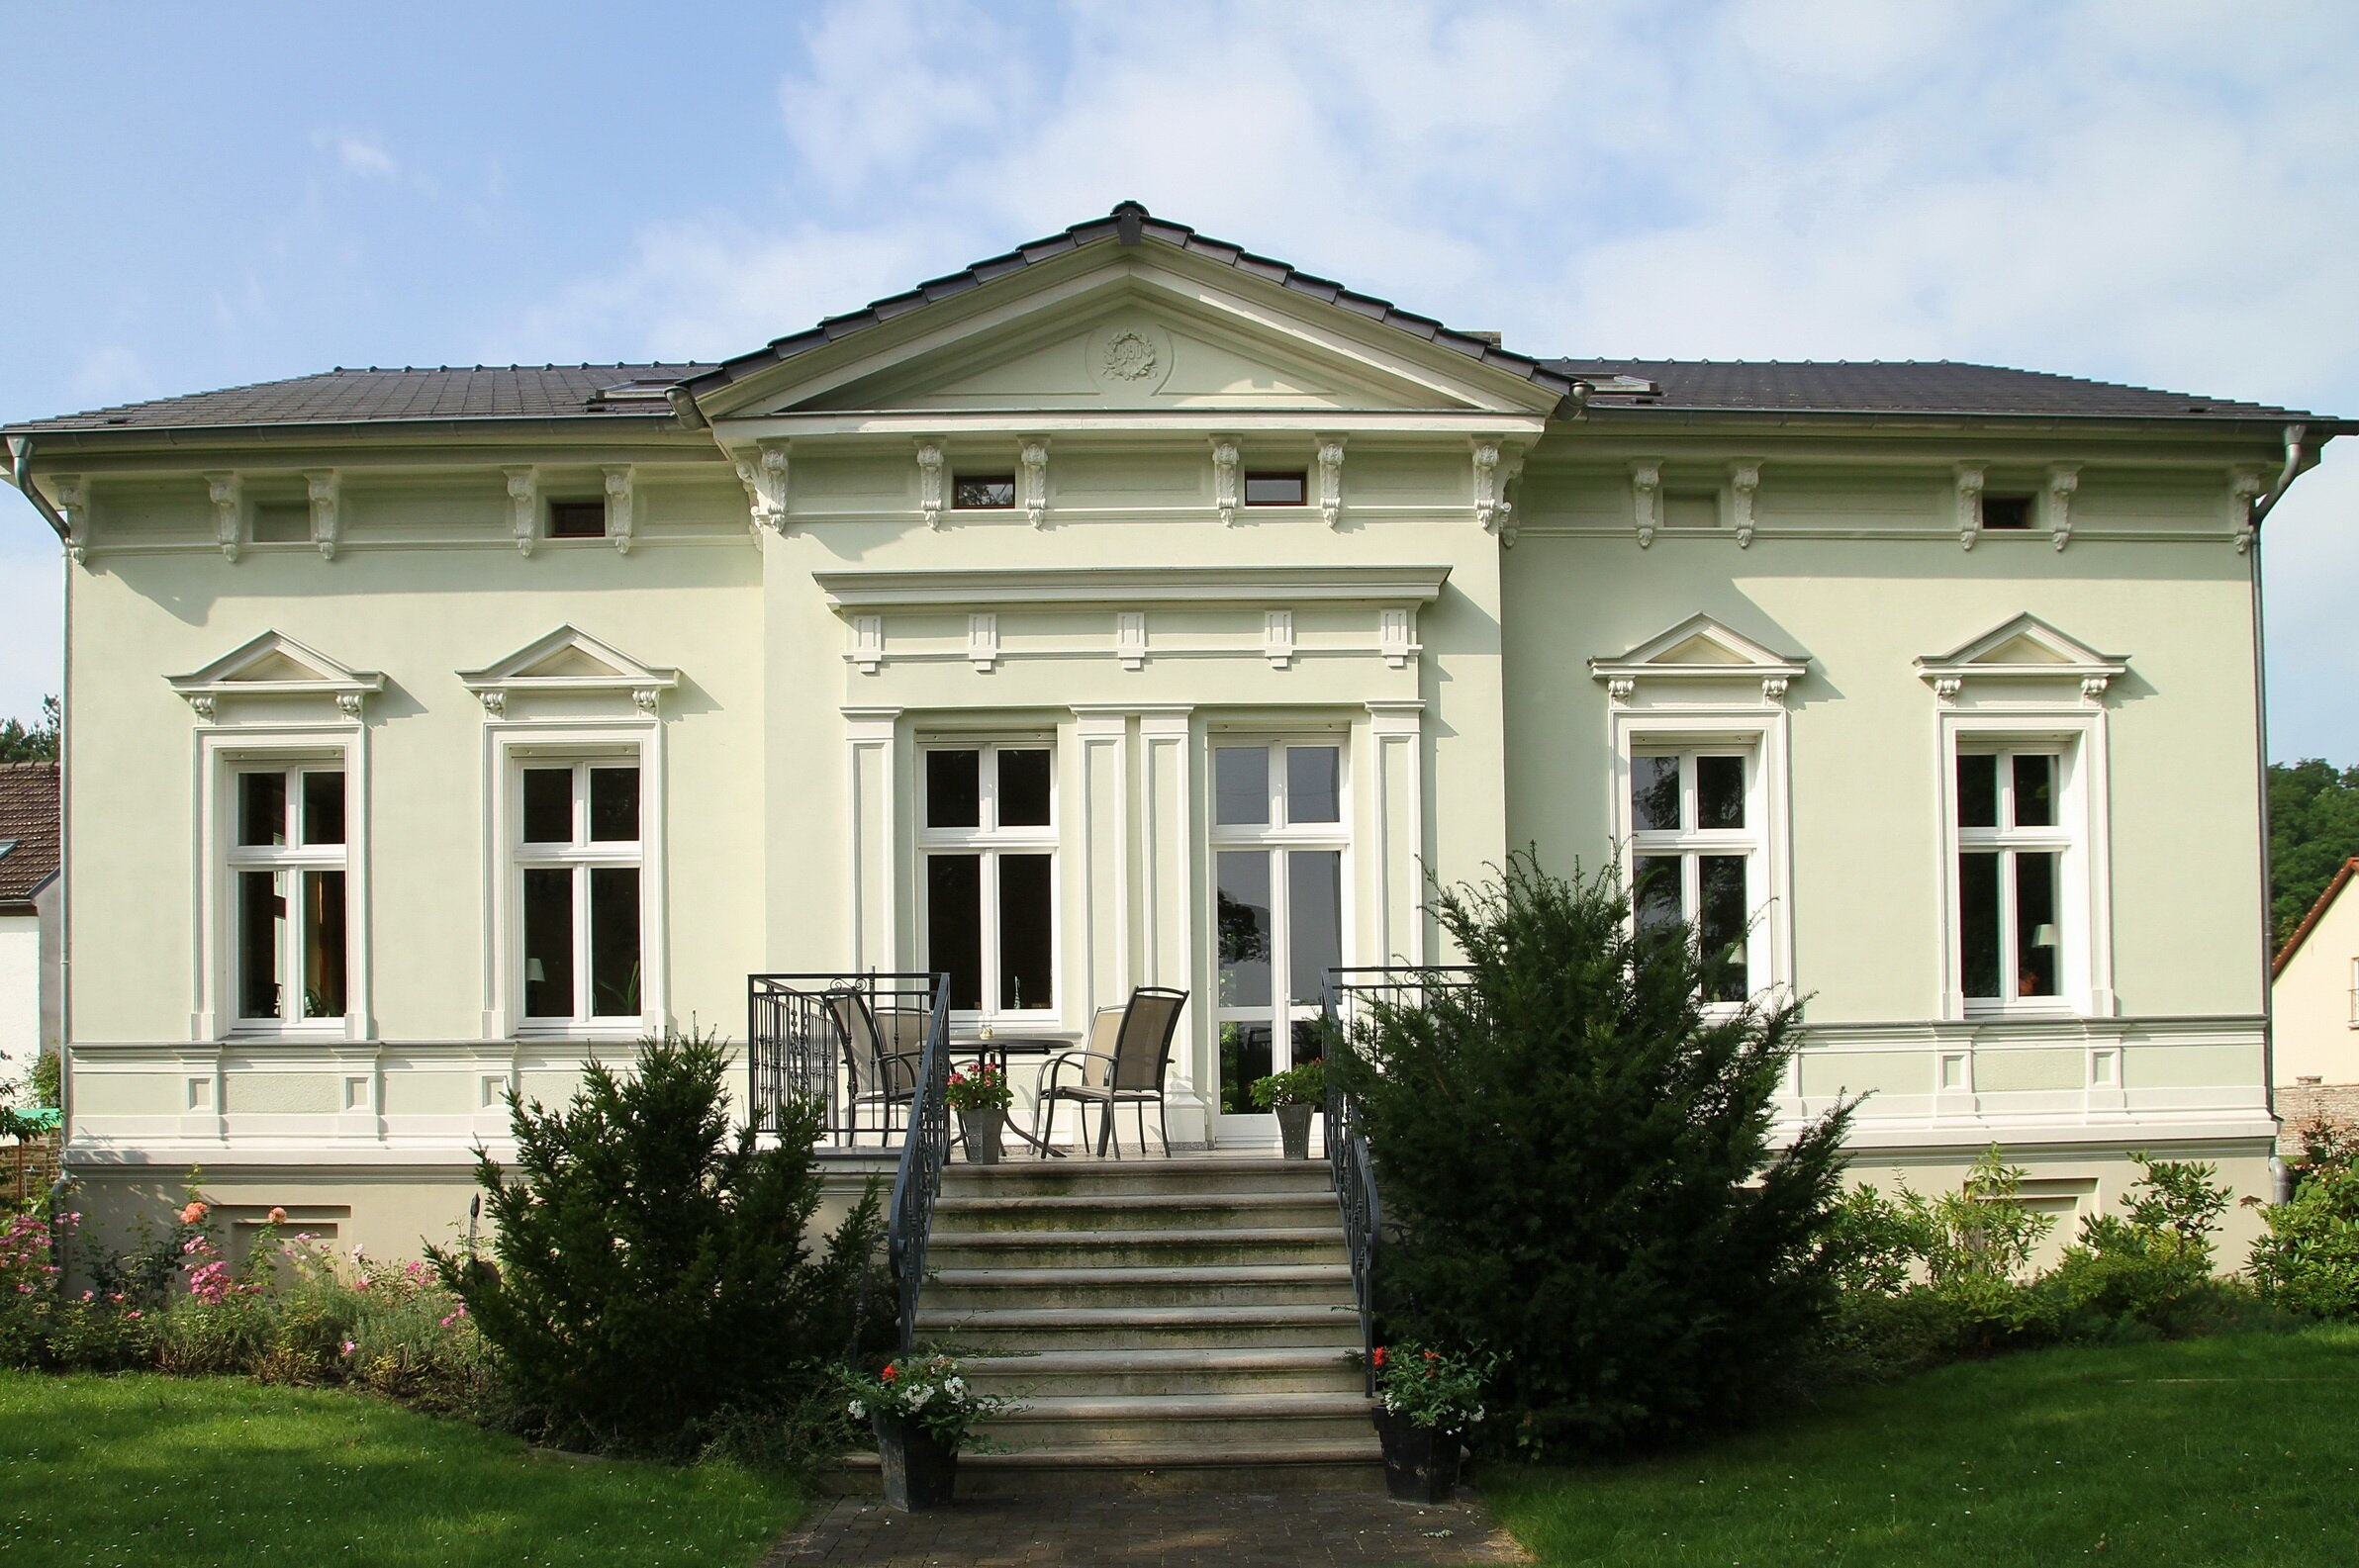 Groß Kreutz (Havel), Brandenburg Region, Germany